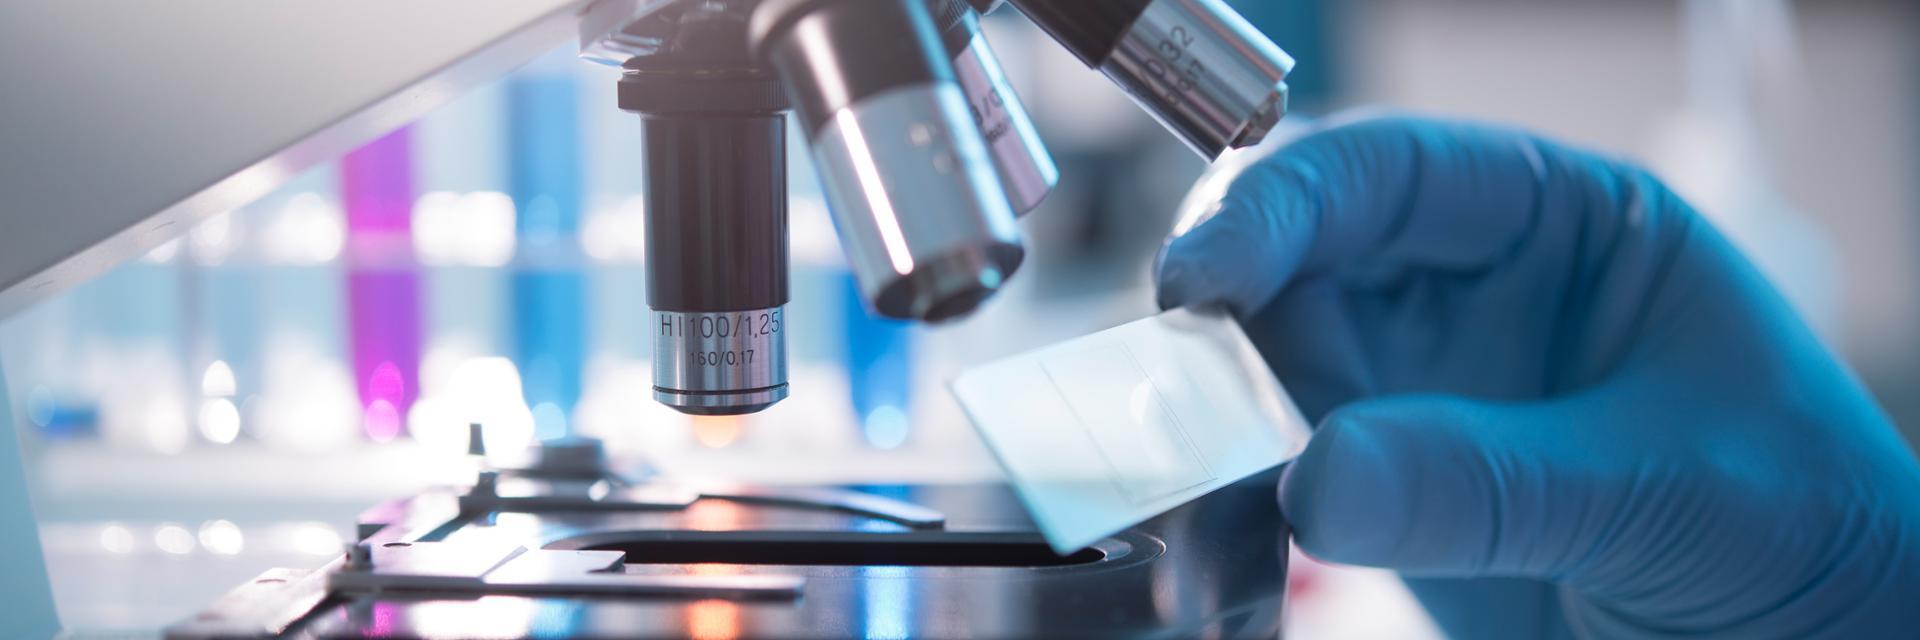 Microscope in Chemistry Lab